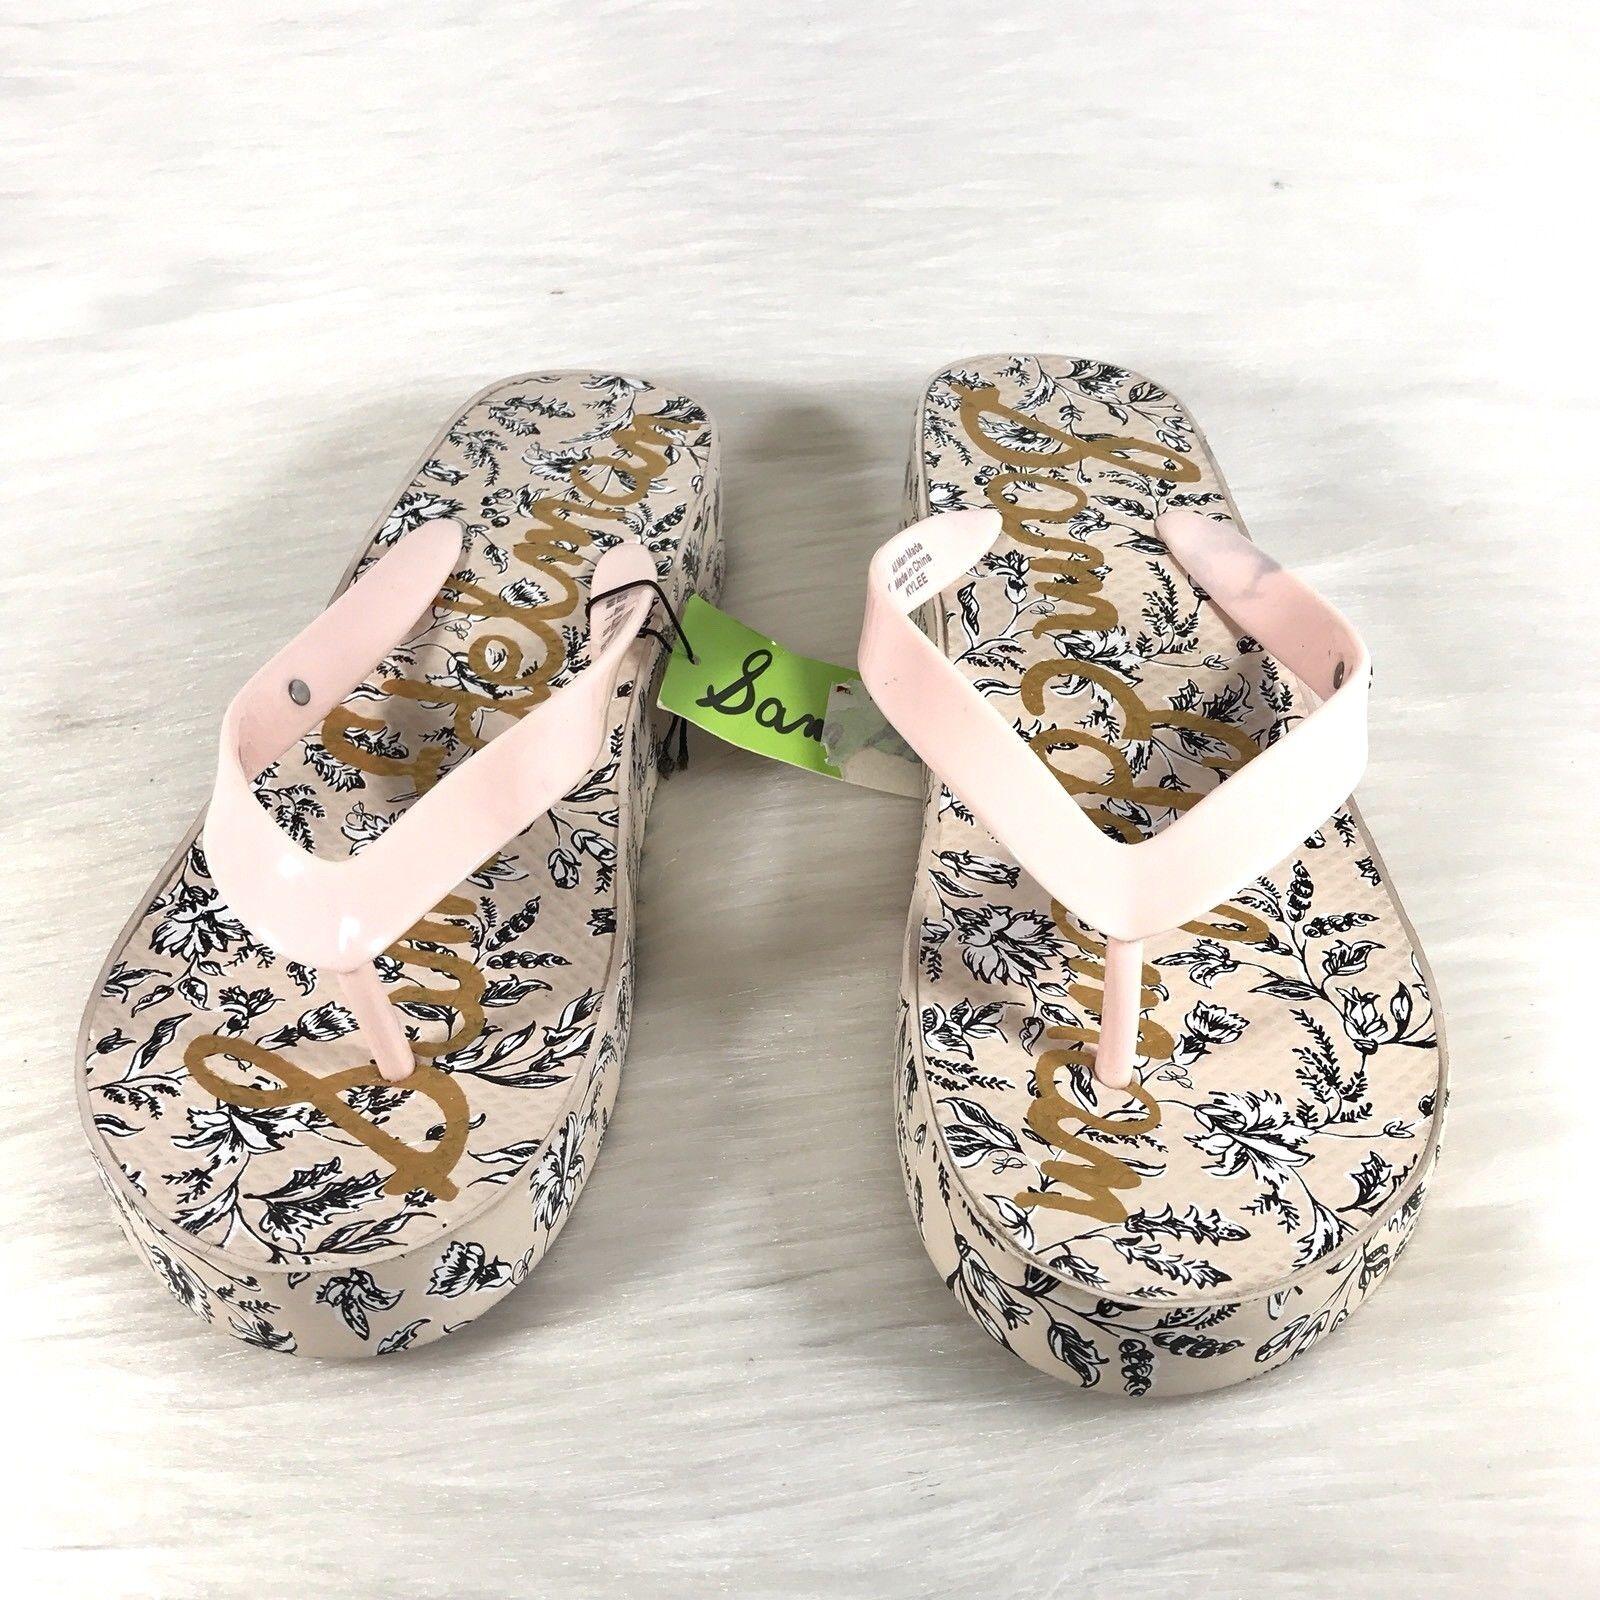 Sam Edelman Kylee Women's Women's Women's Thong Sandals Pink Floral Size 9 M New 6a6ad4